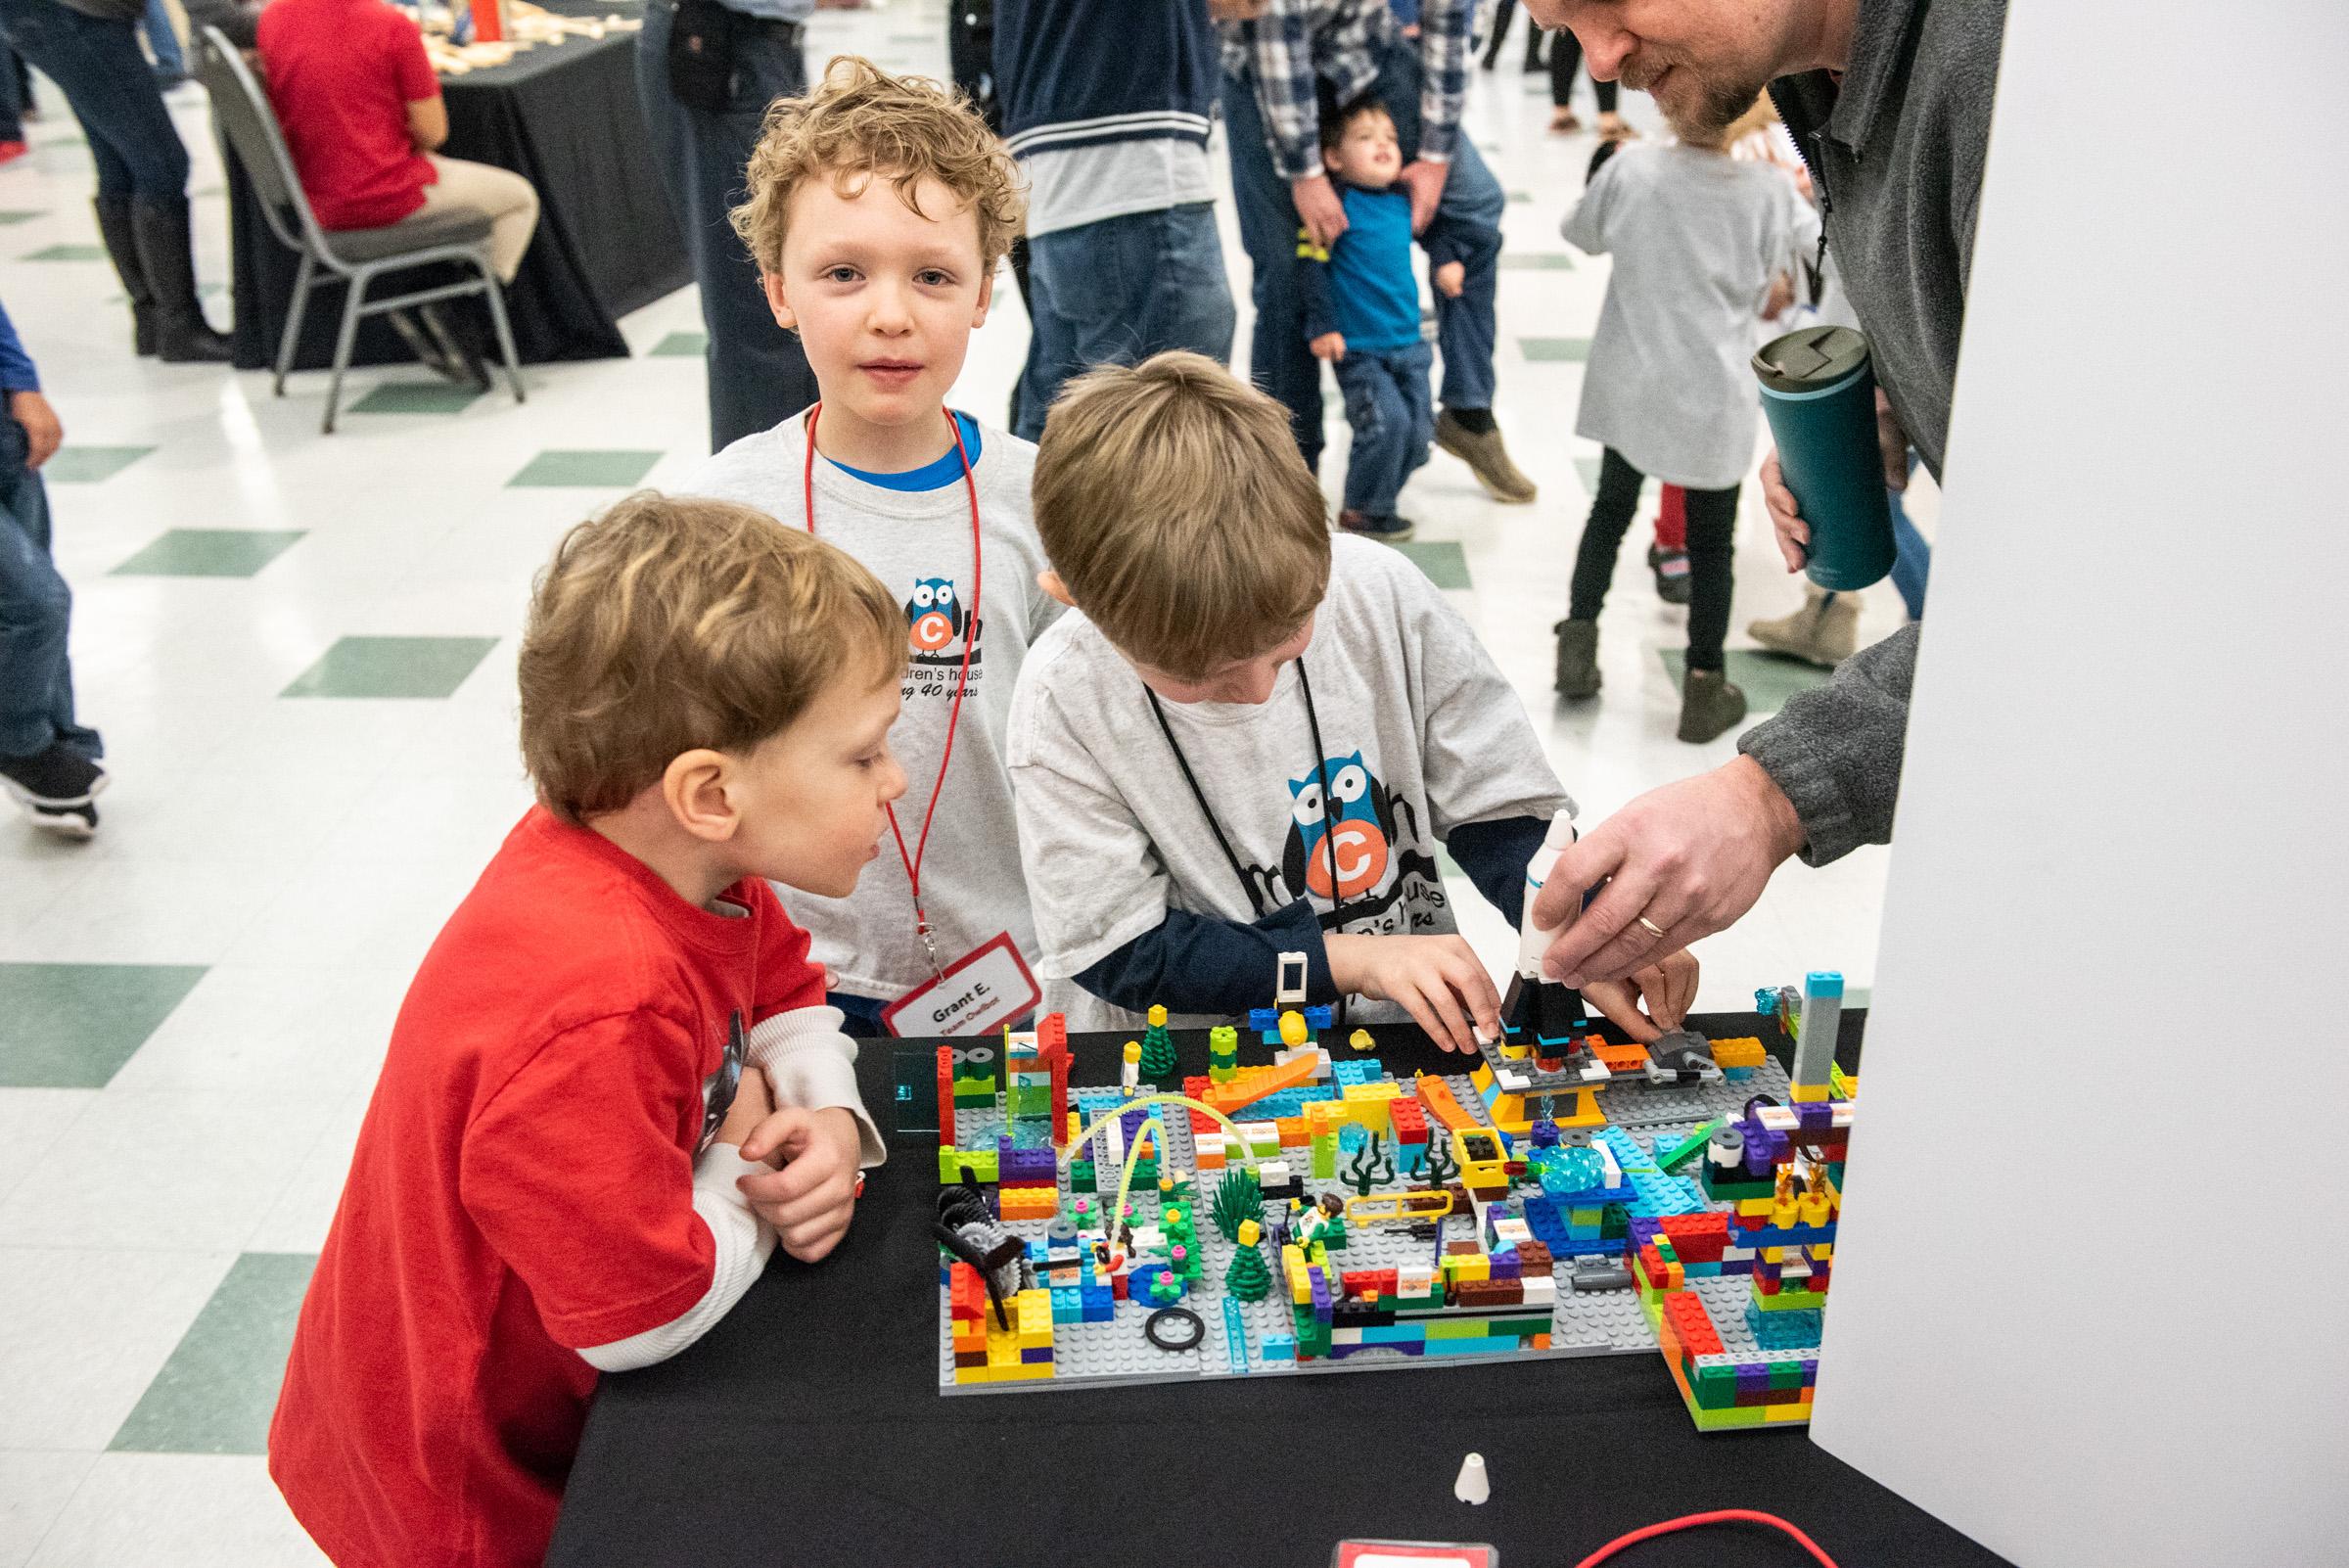 2019.01.19 Lego League FI Blog RES-017.jpg